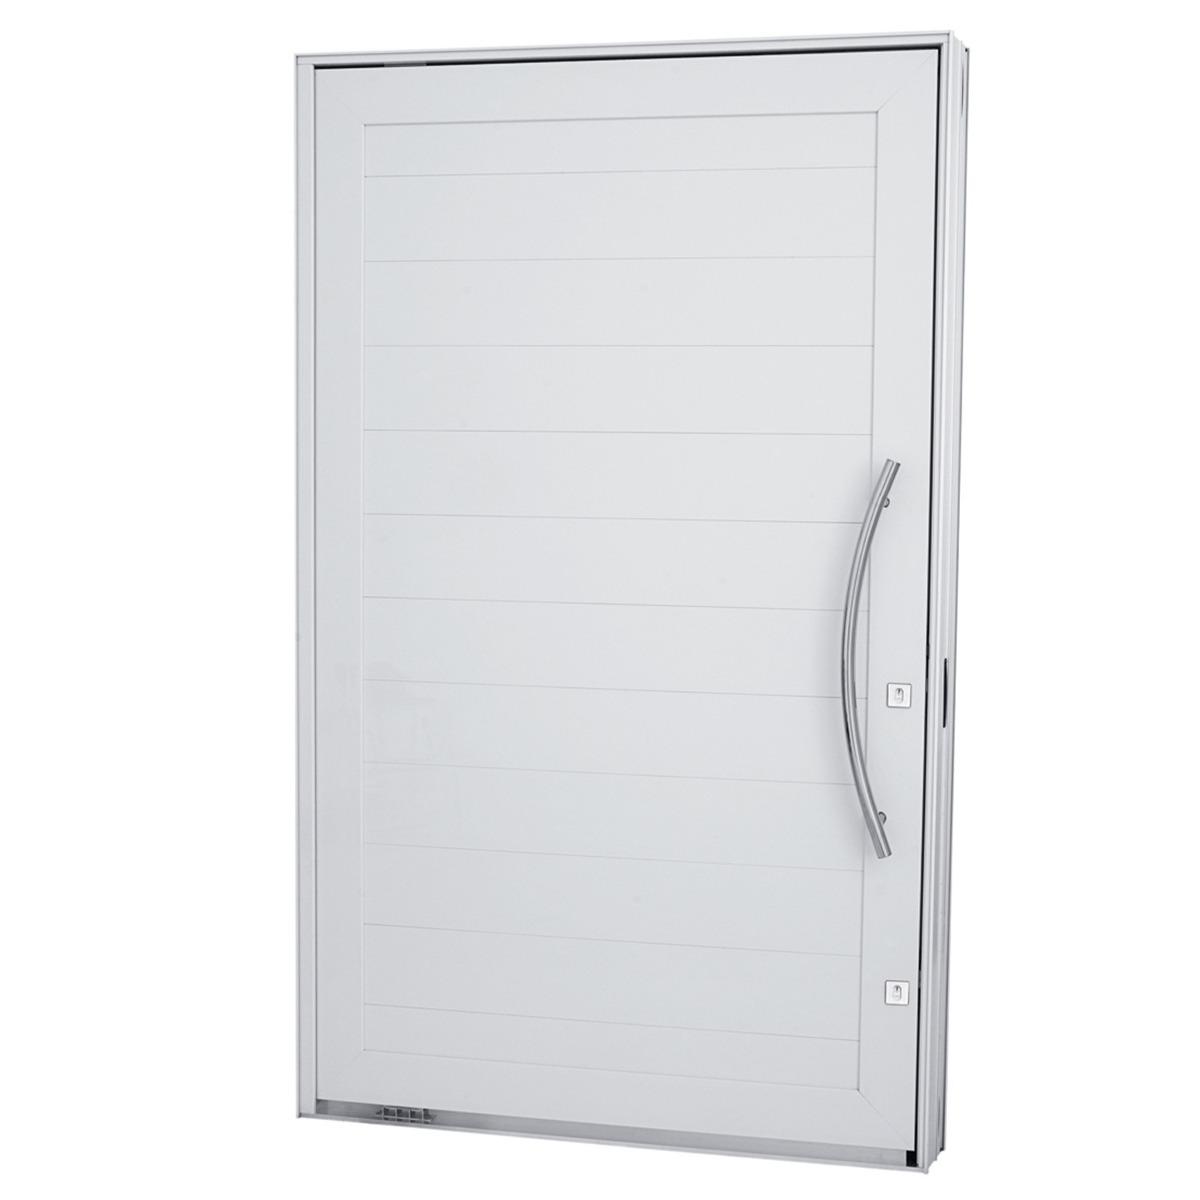 #5D636E Porta Pivotante Em Aluminio Lambris Sasazaki Branc 243x144x1 Pictures  1100 Portas E Janelas De Aluminio Na Telha Norte